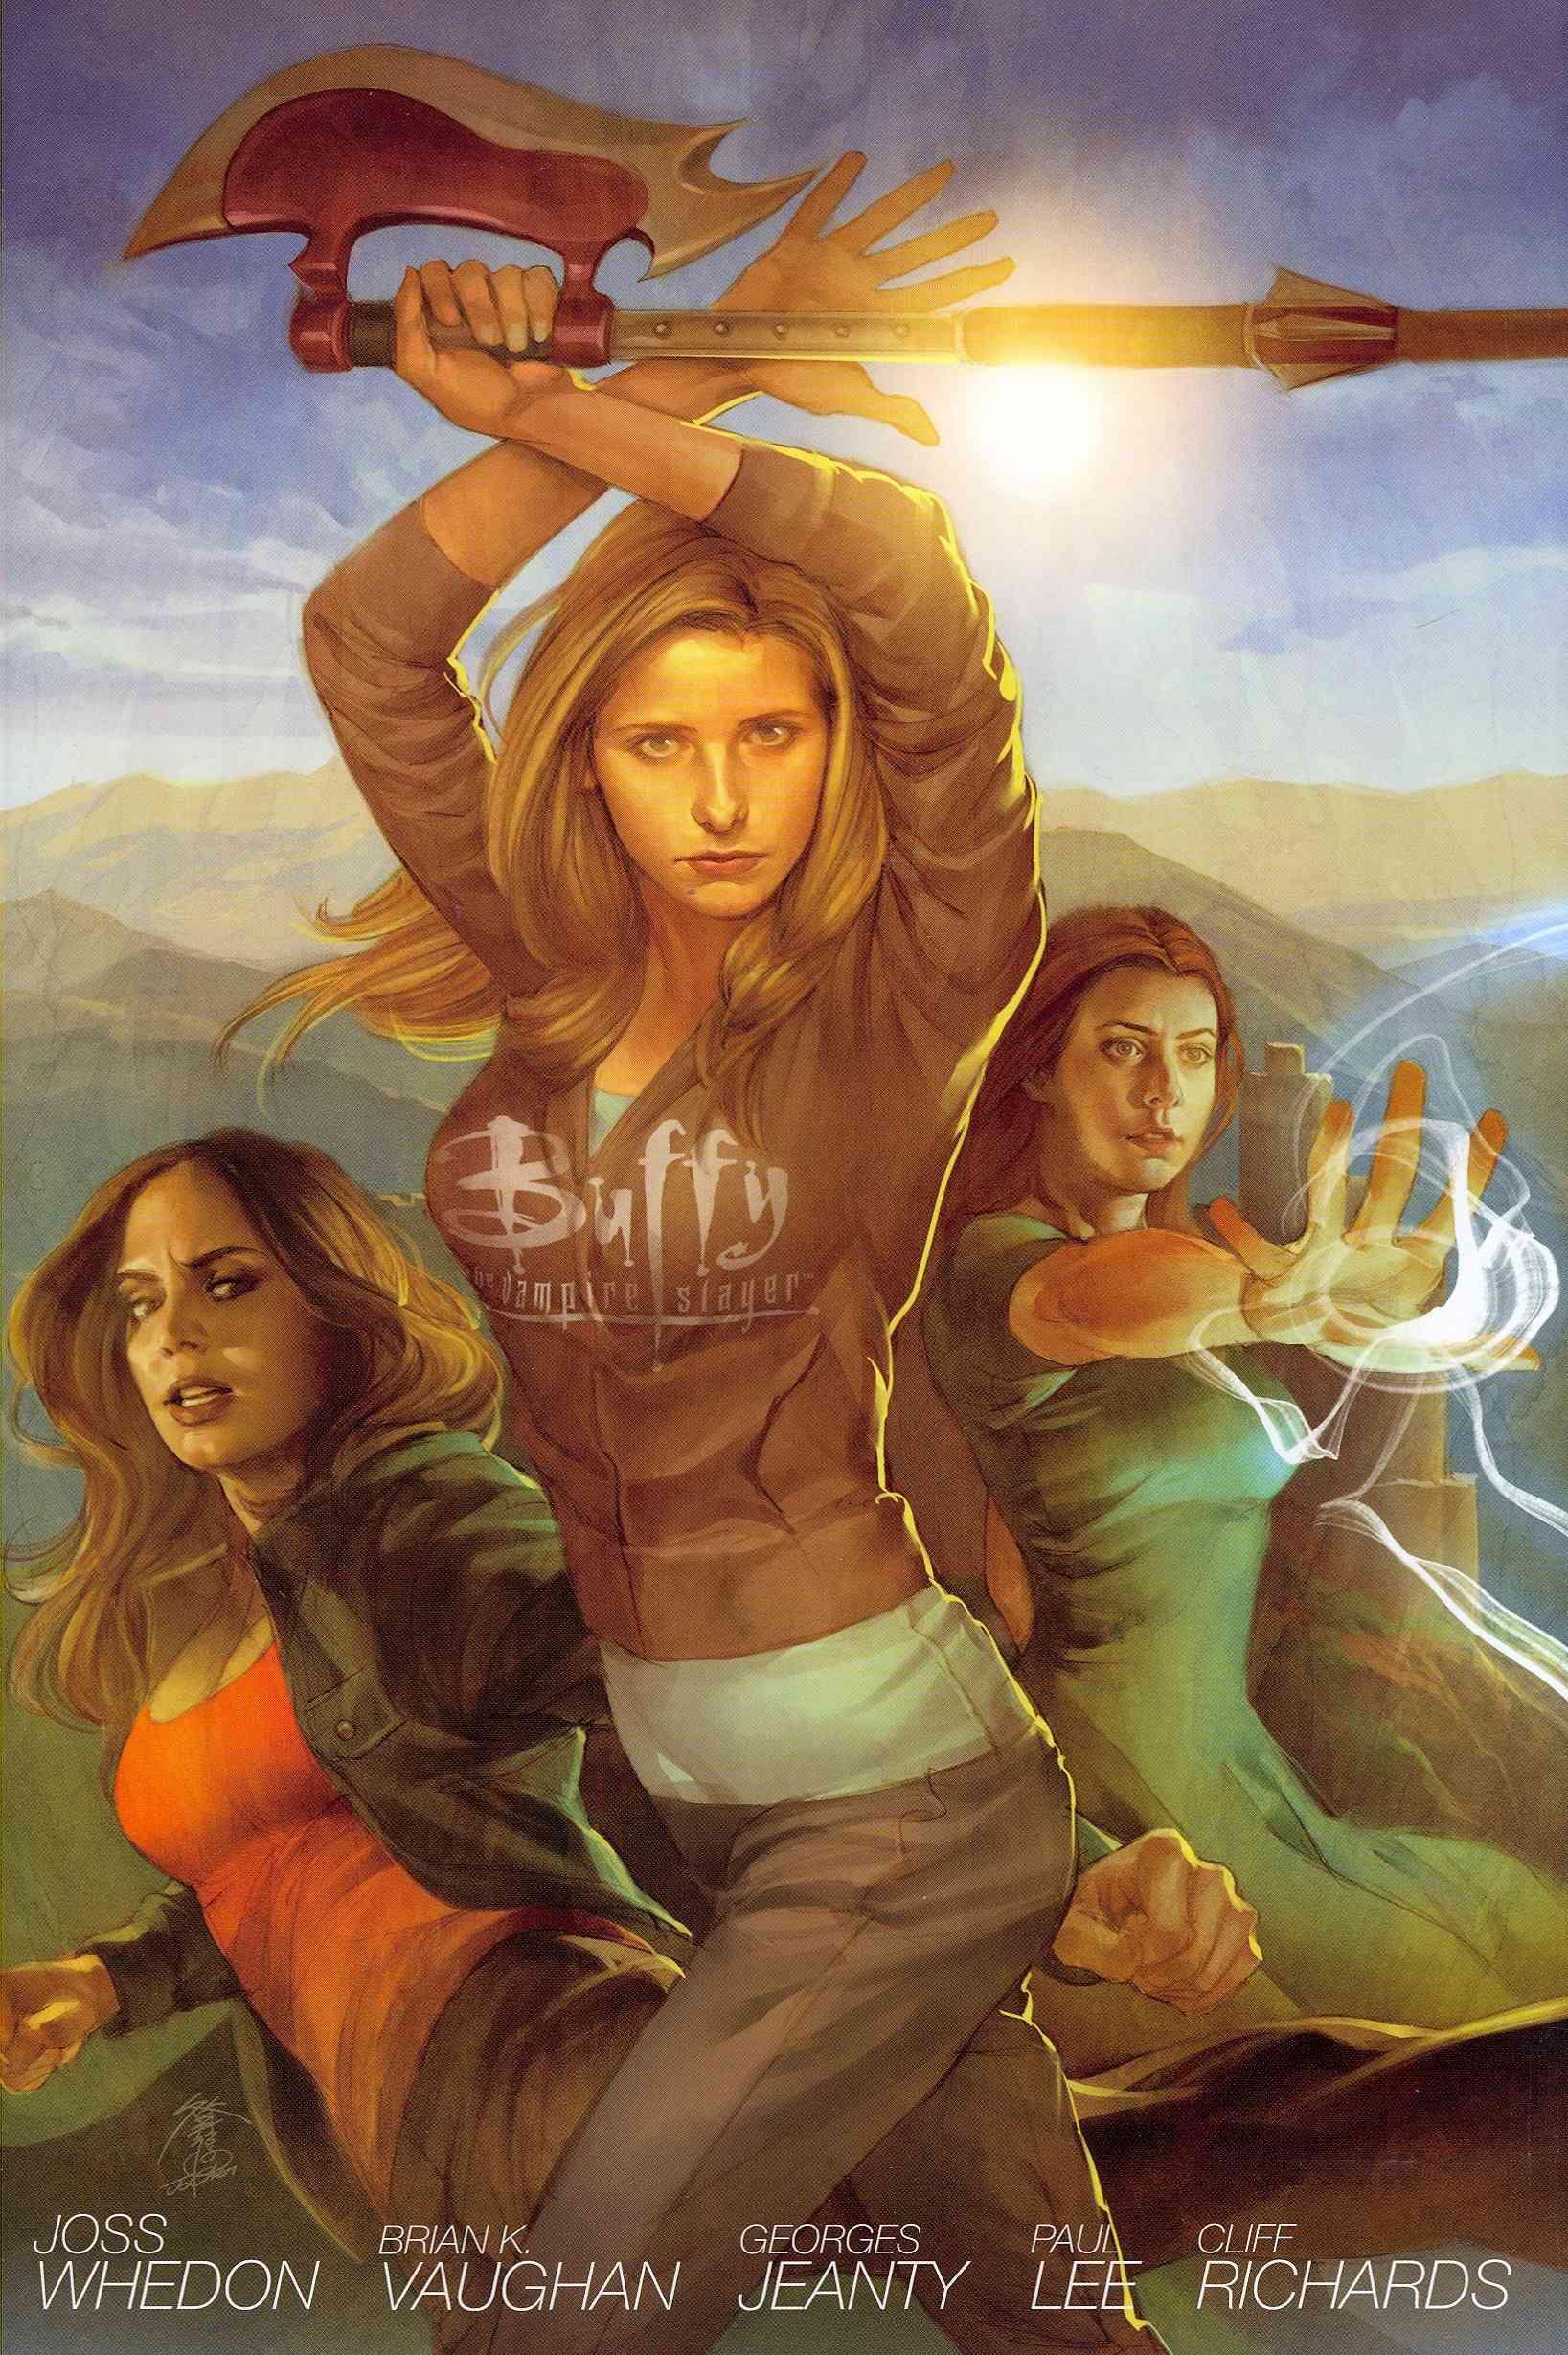 Buffy the Vampire Slayer Season 8 1 (Hardcover)